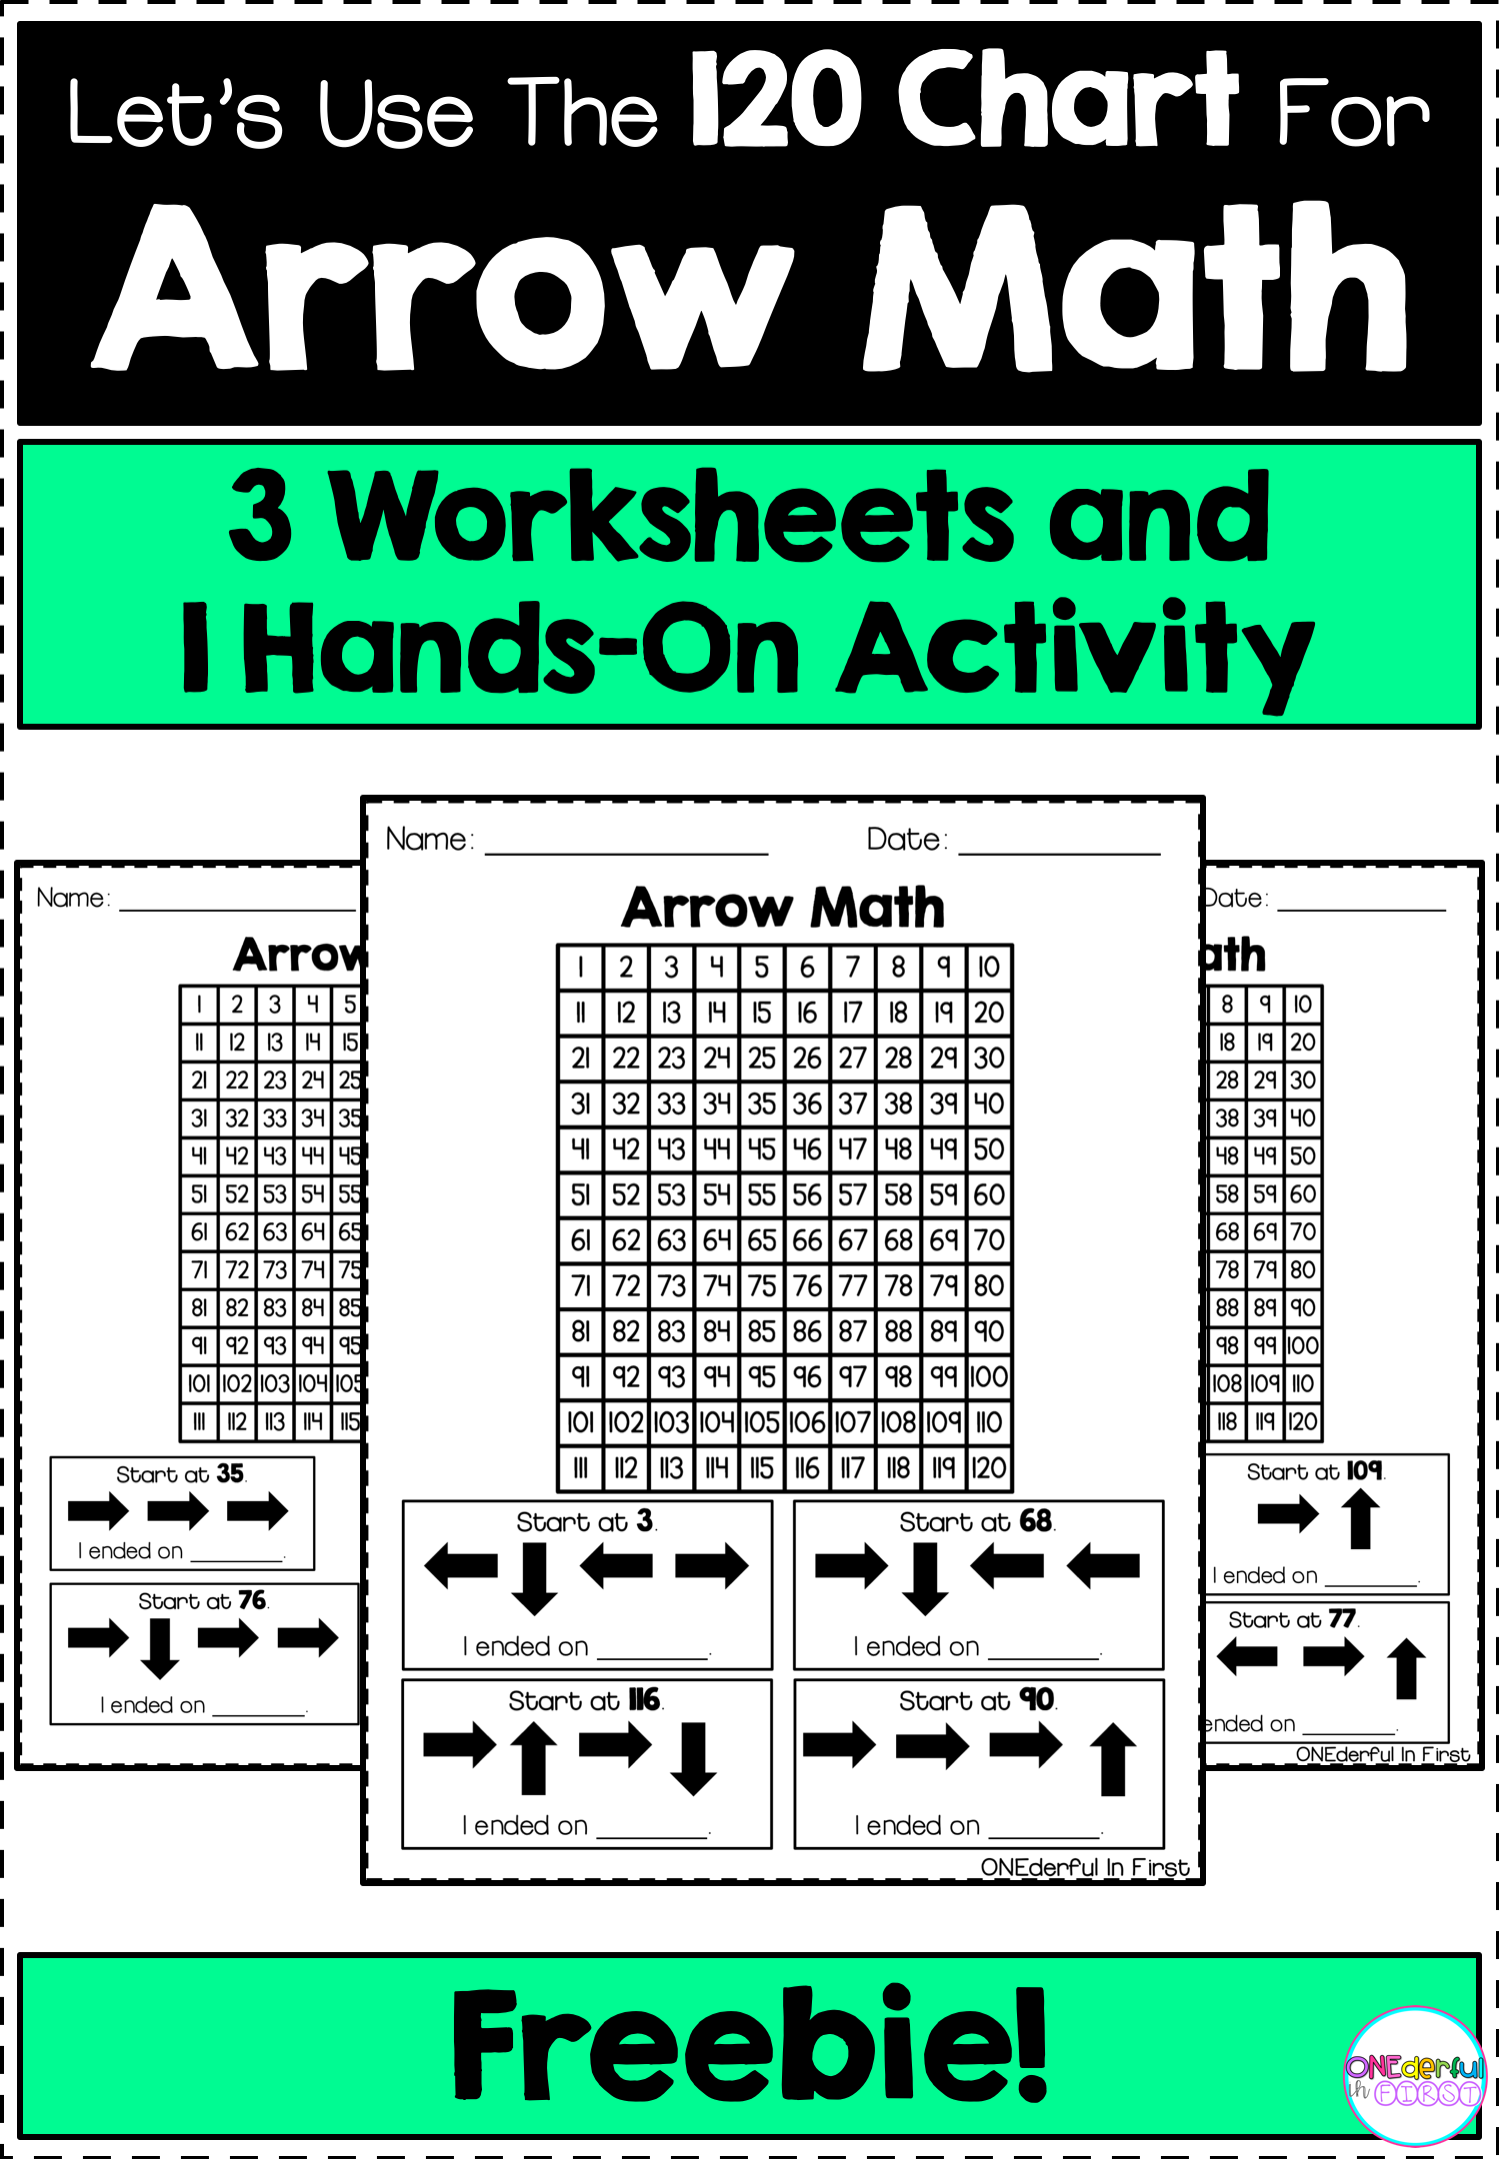 120 Chart Arrow Math Math 120 Chart Elementary Lesson [ 2159 x 1499 Pixel ]